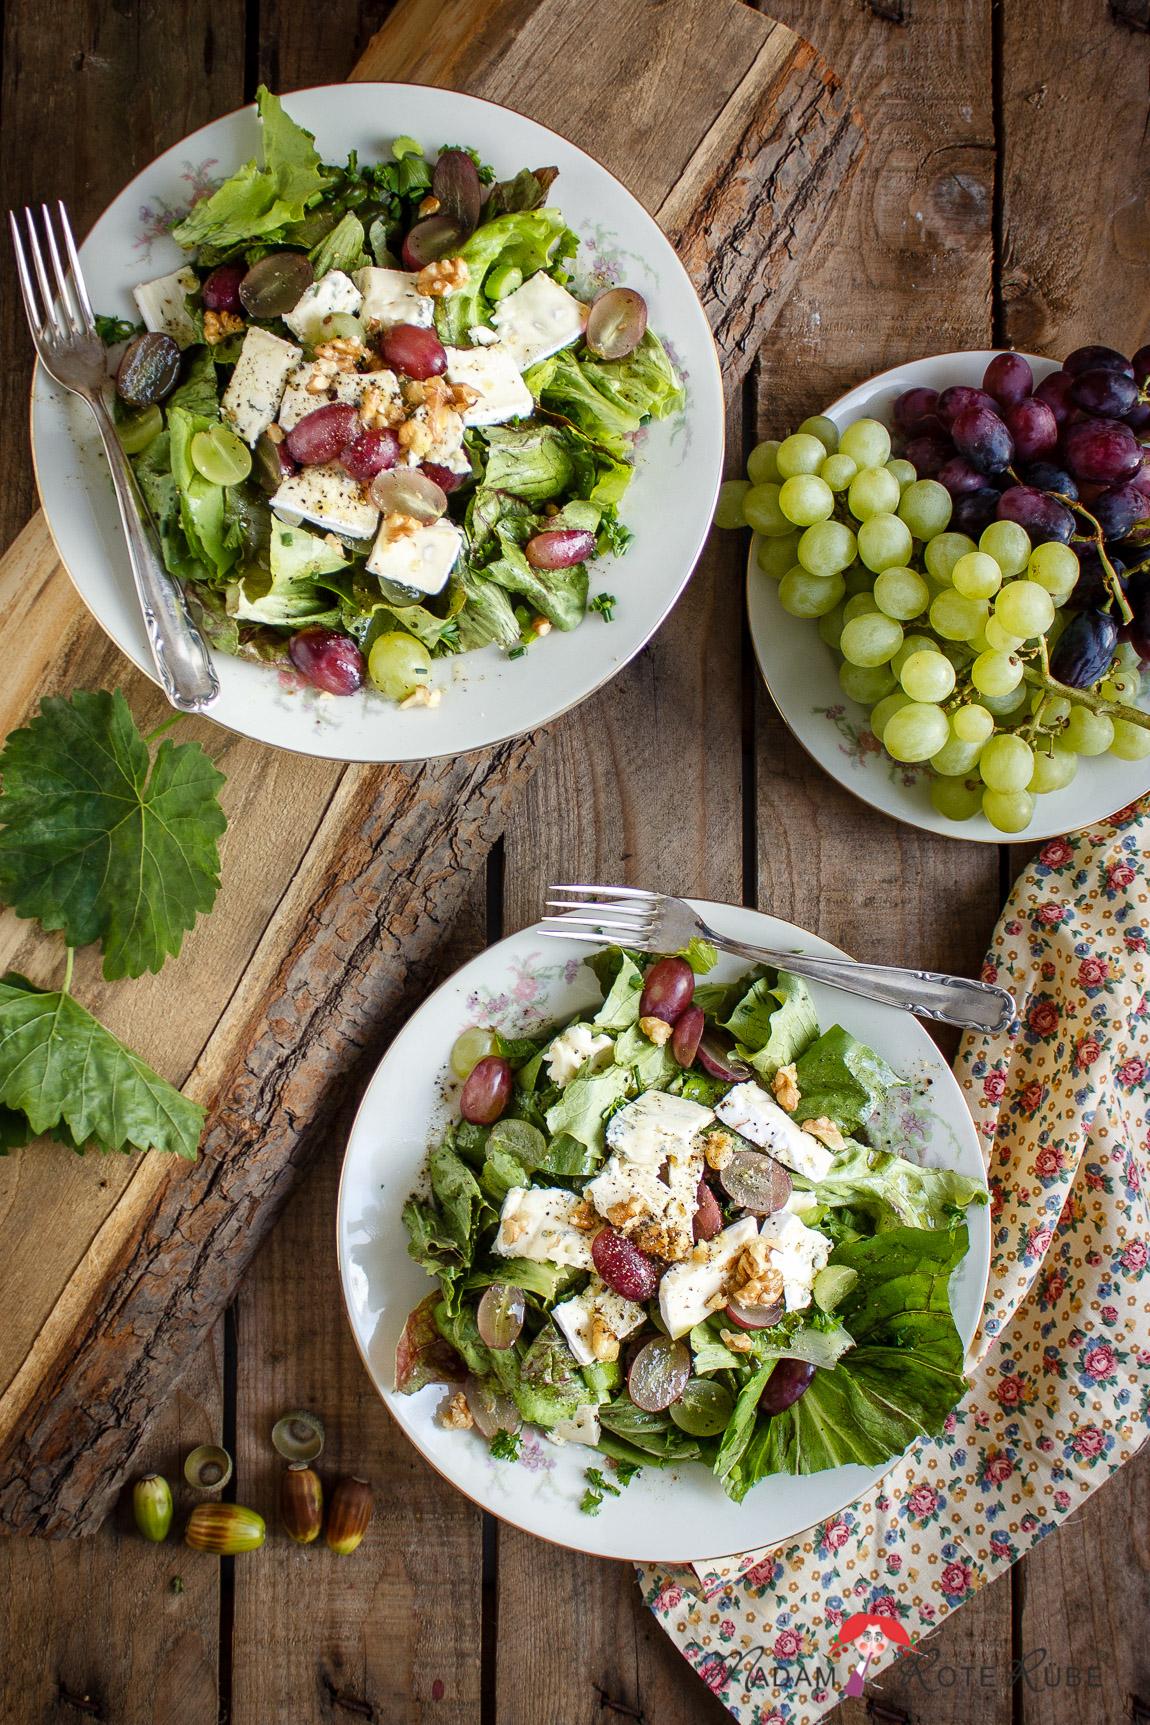 herbst bunte bl tter dann bitte auch k se trauben salat madam rote r be. Black Bedroom Furniture Sets. Home Design Ideas